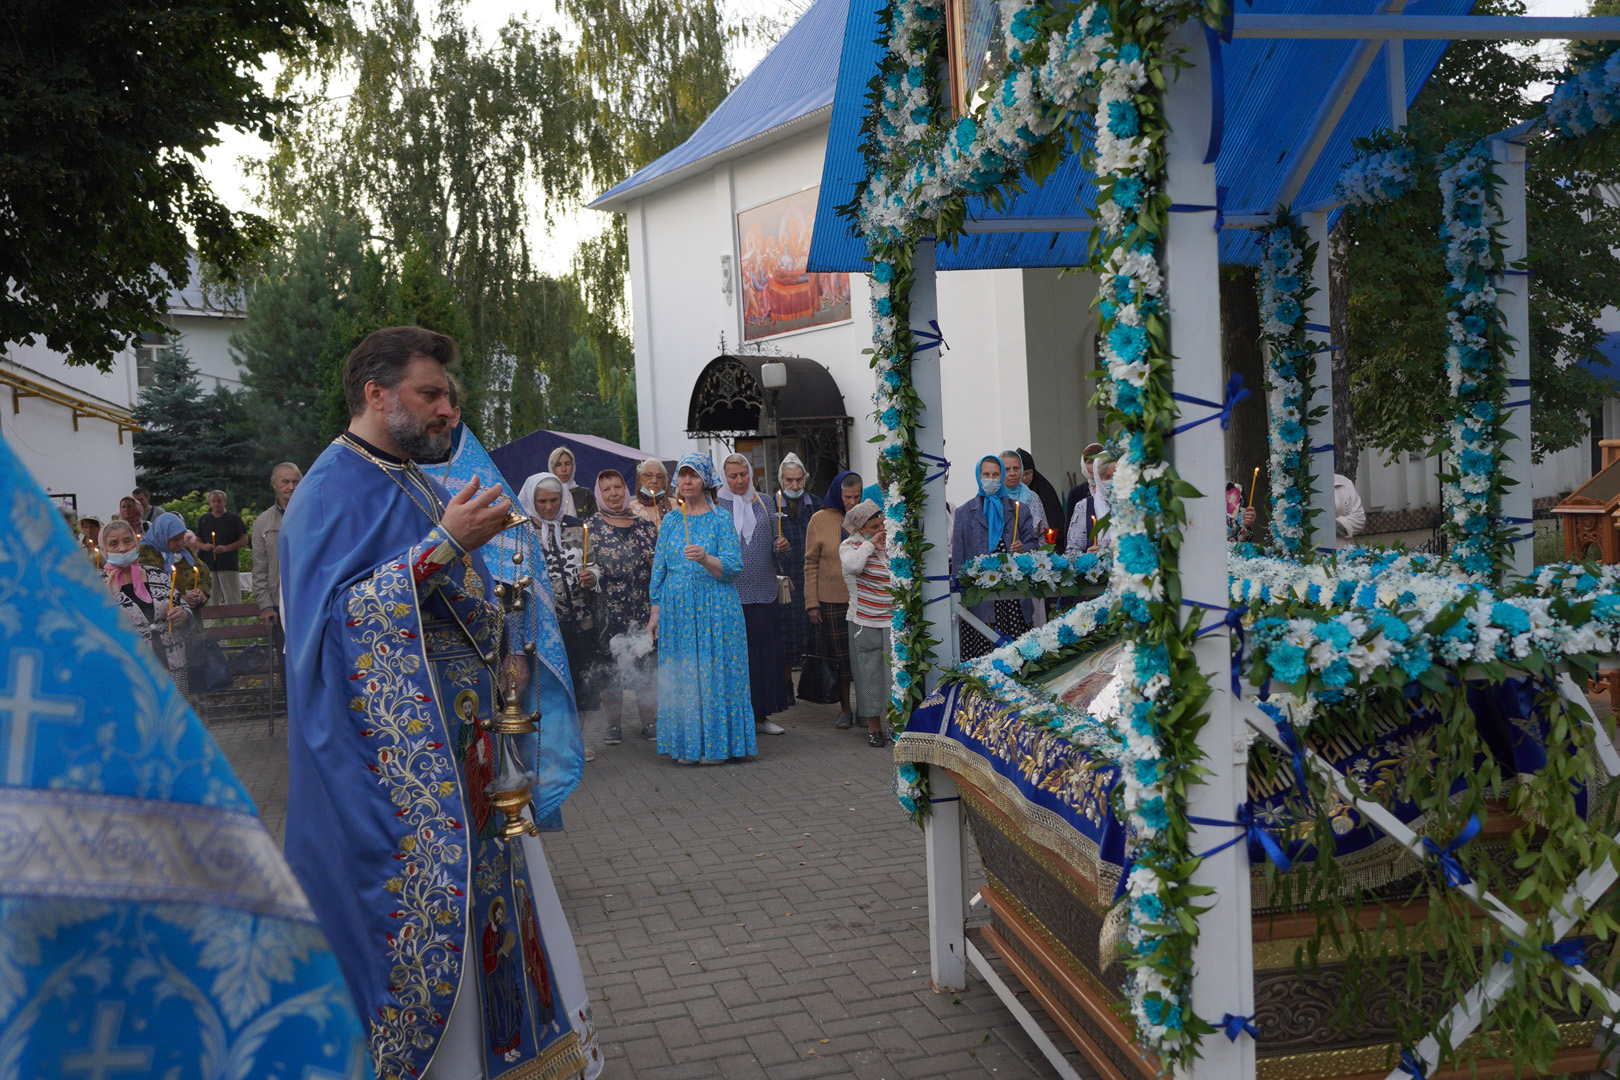 http://monuspen.ru/photoreports/eb9de00e1f5615849ea00b127bfcb98x.jpg